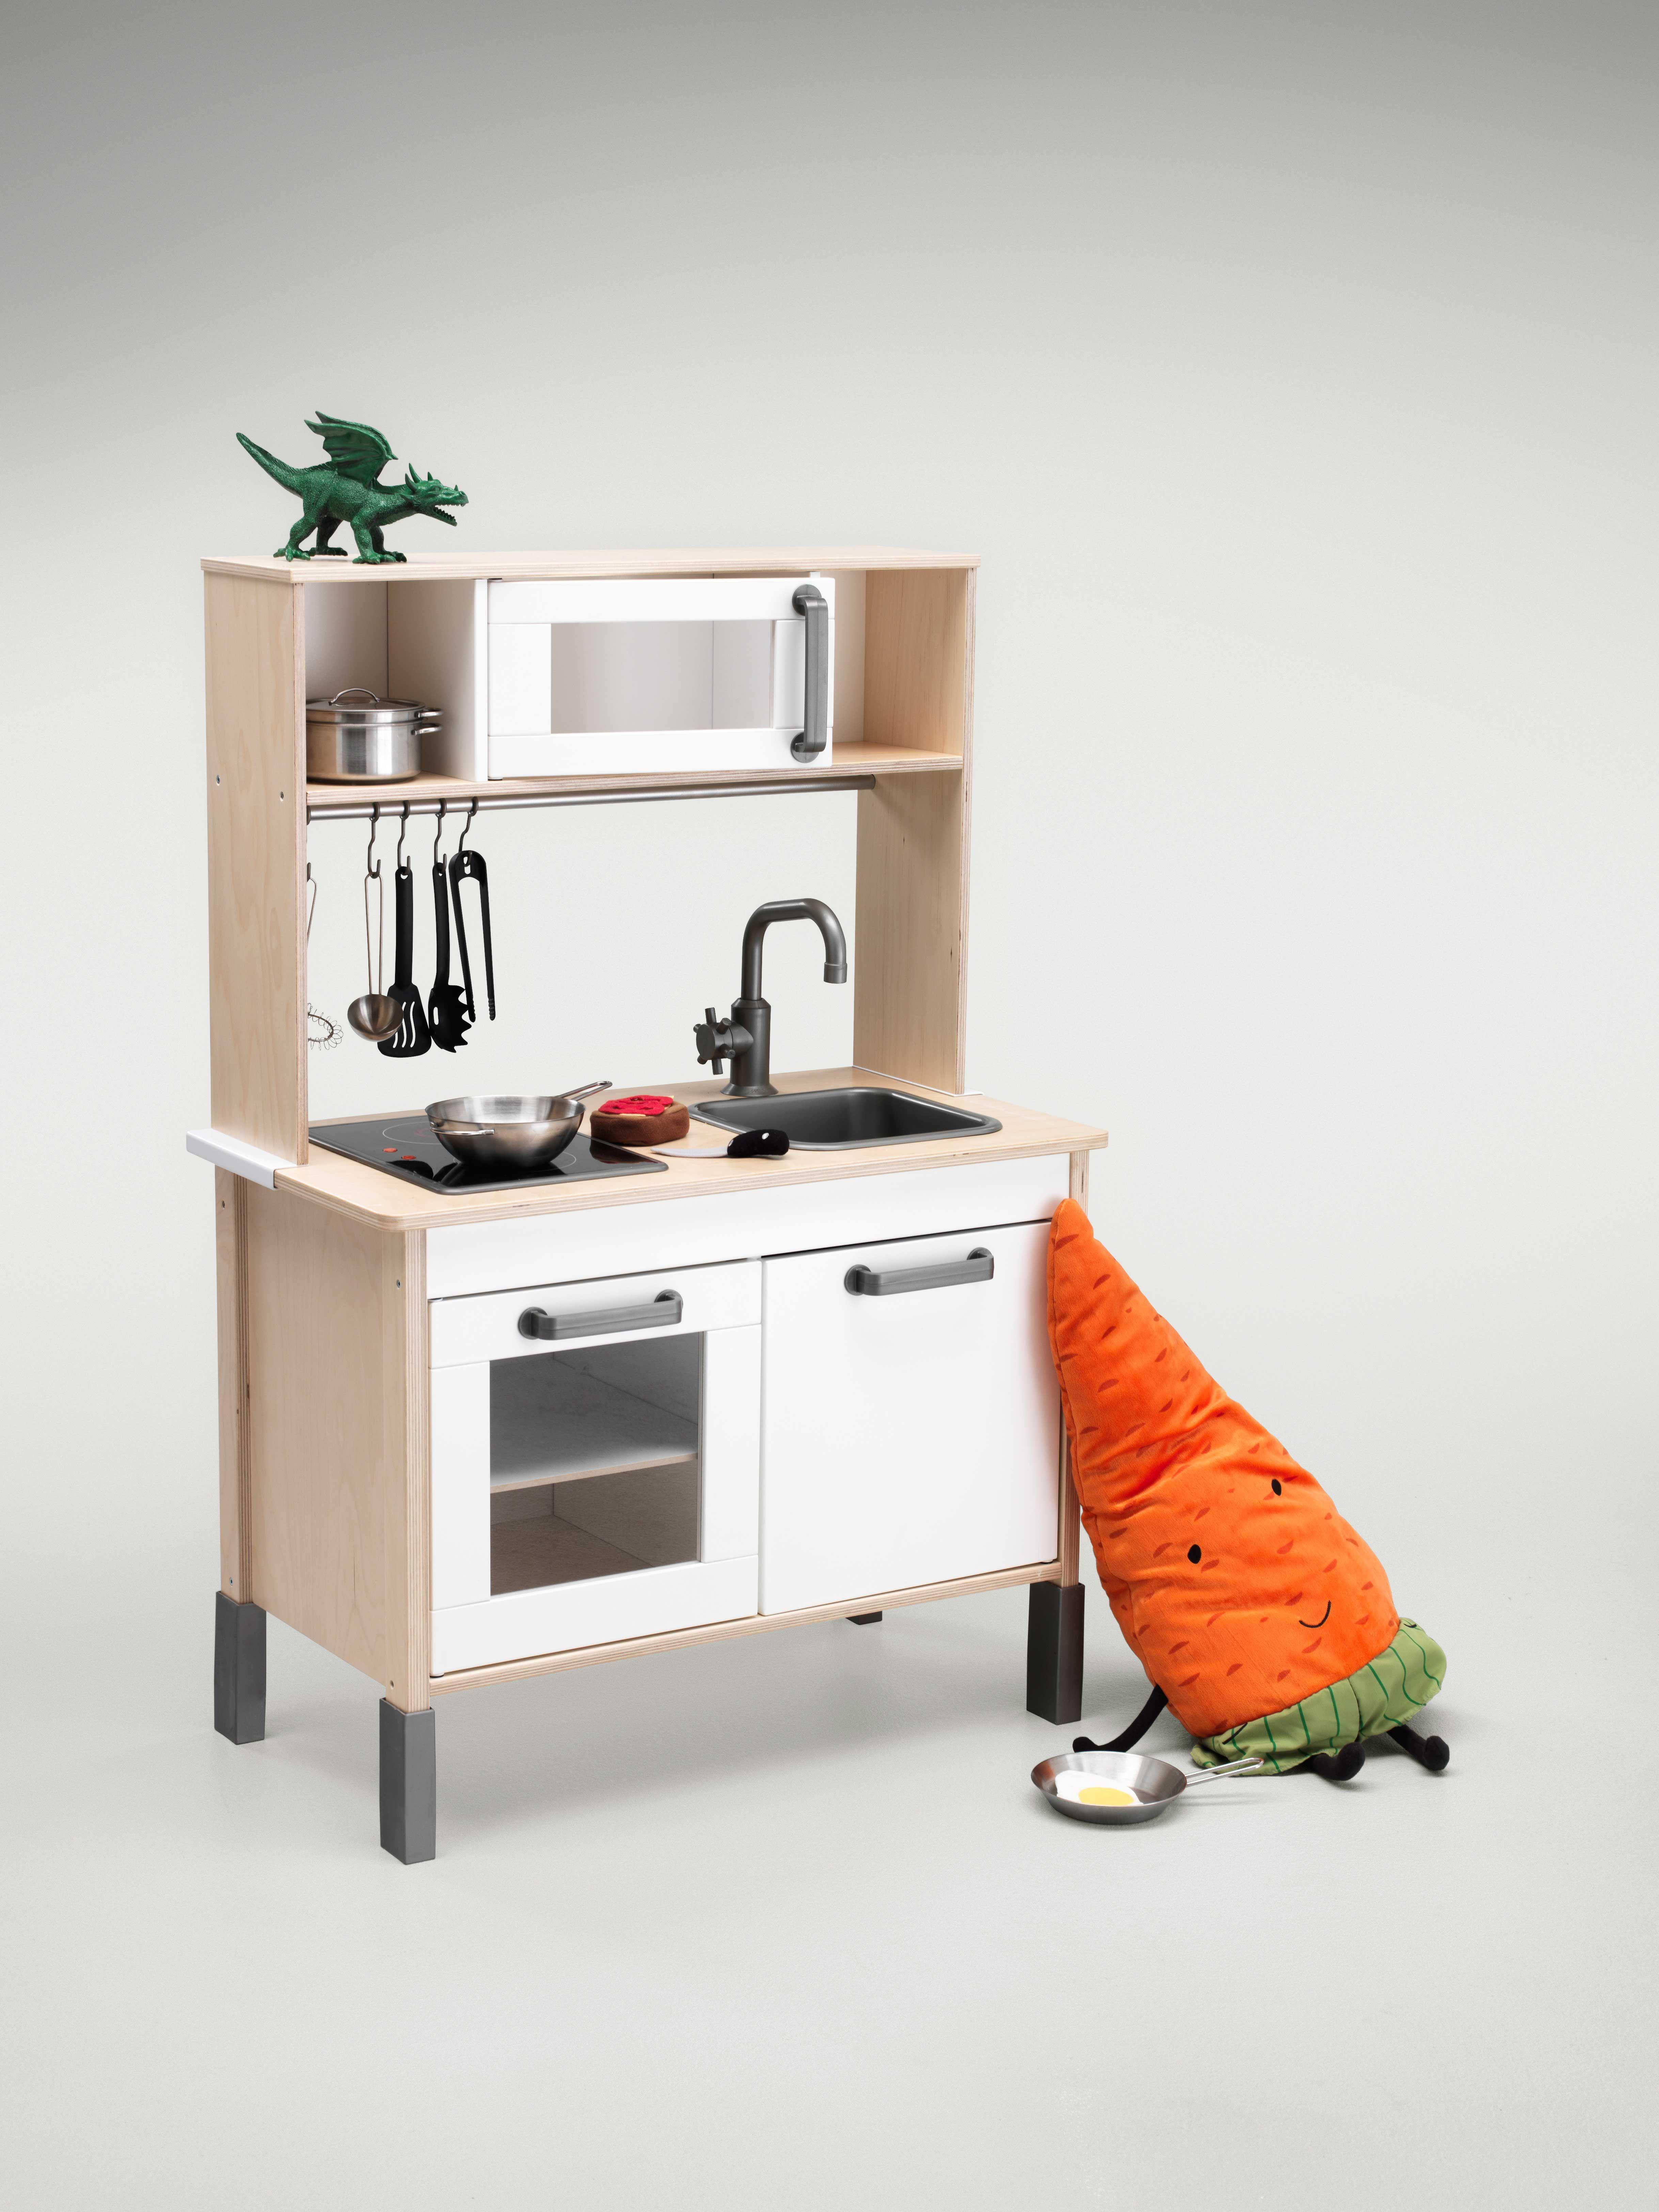 Ikea Sterreich, Inspiration, Kinder, Kids, Kinderm Bel, Kinderzimmer, Spielzeug, Minik